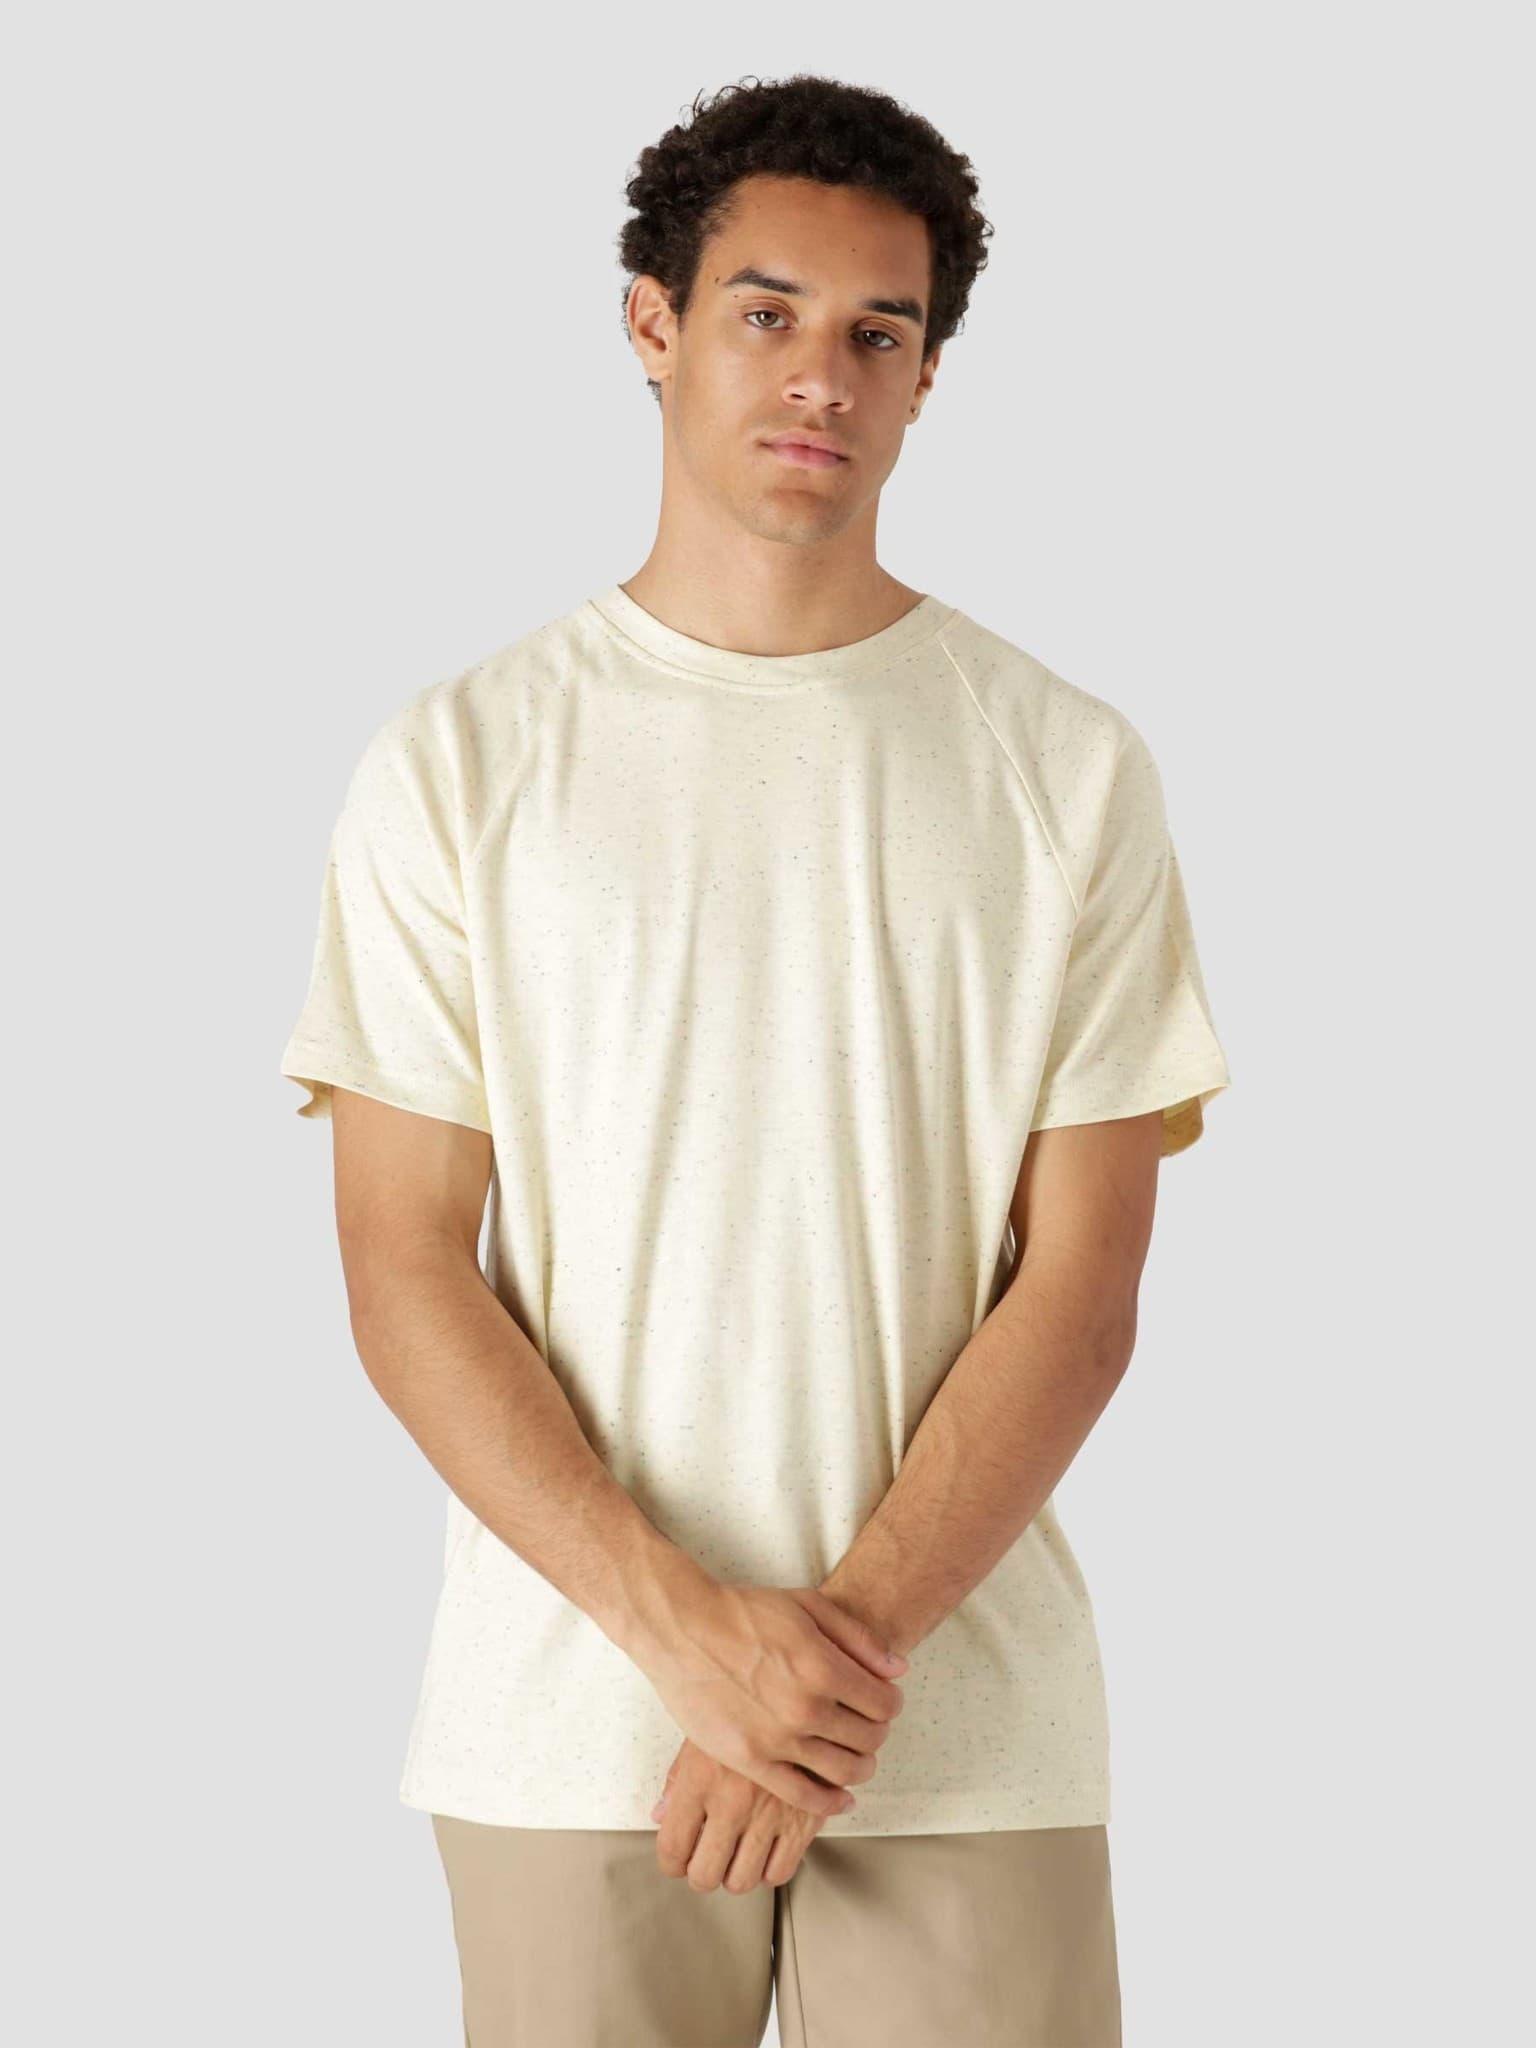 QB301 Speckle T-shirt Off White